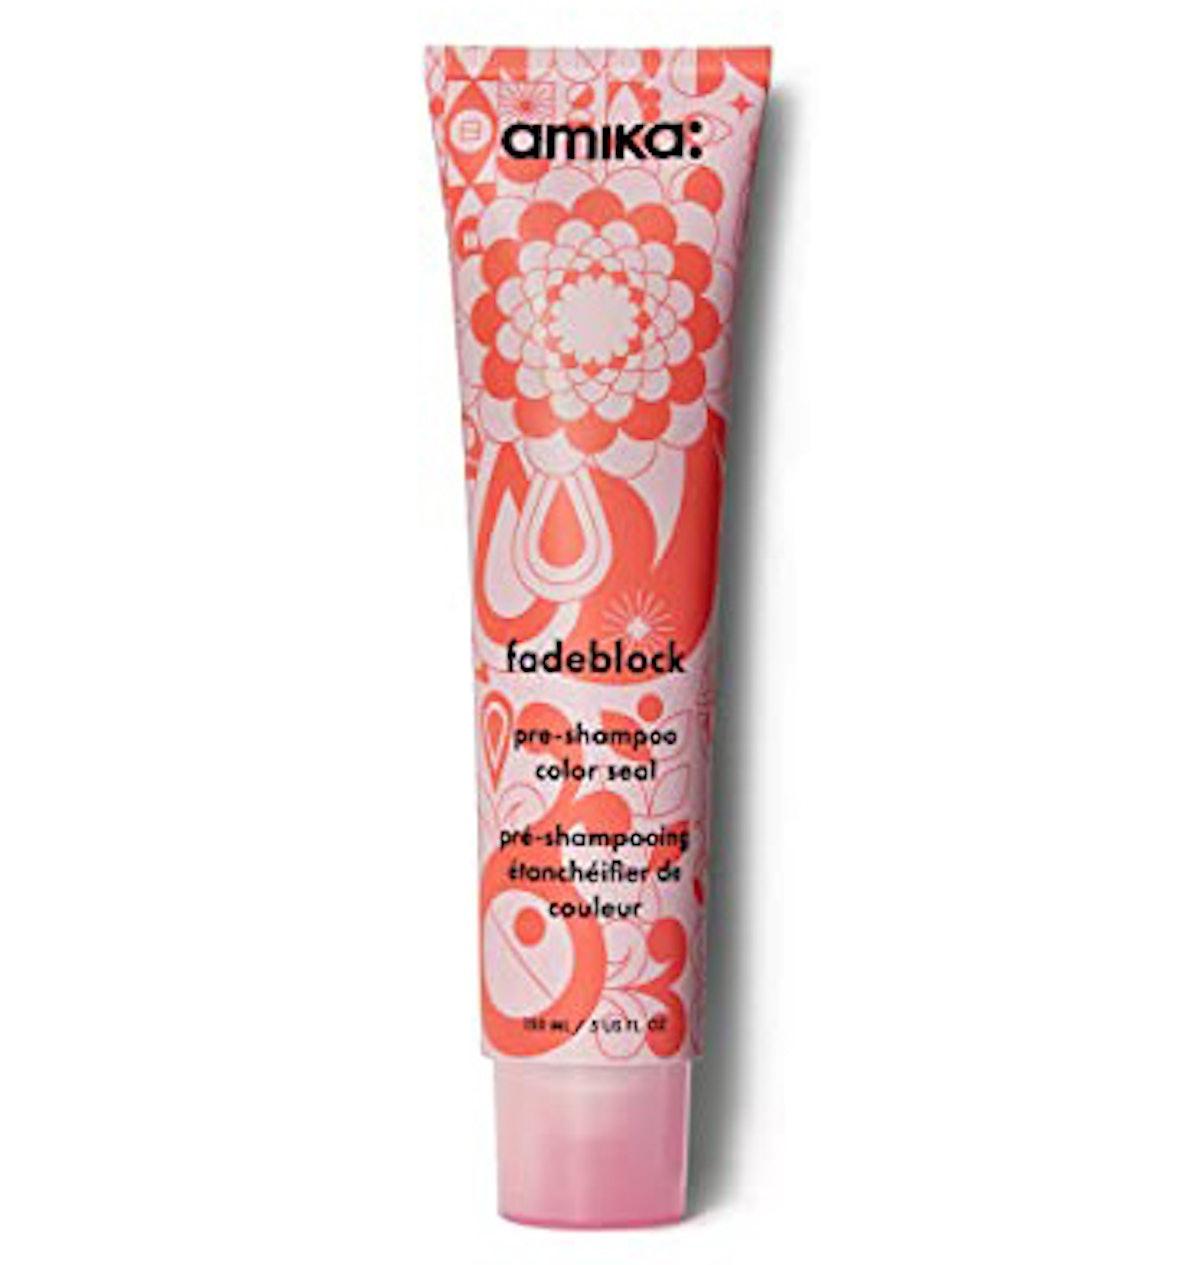 amika Fadeblock Pre-Shampoo Color Seal